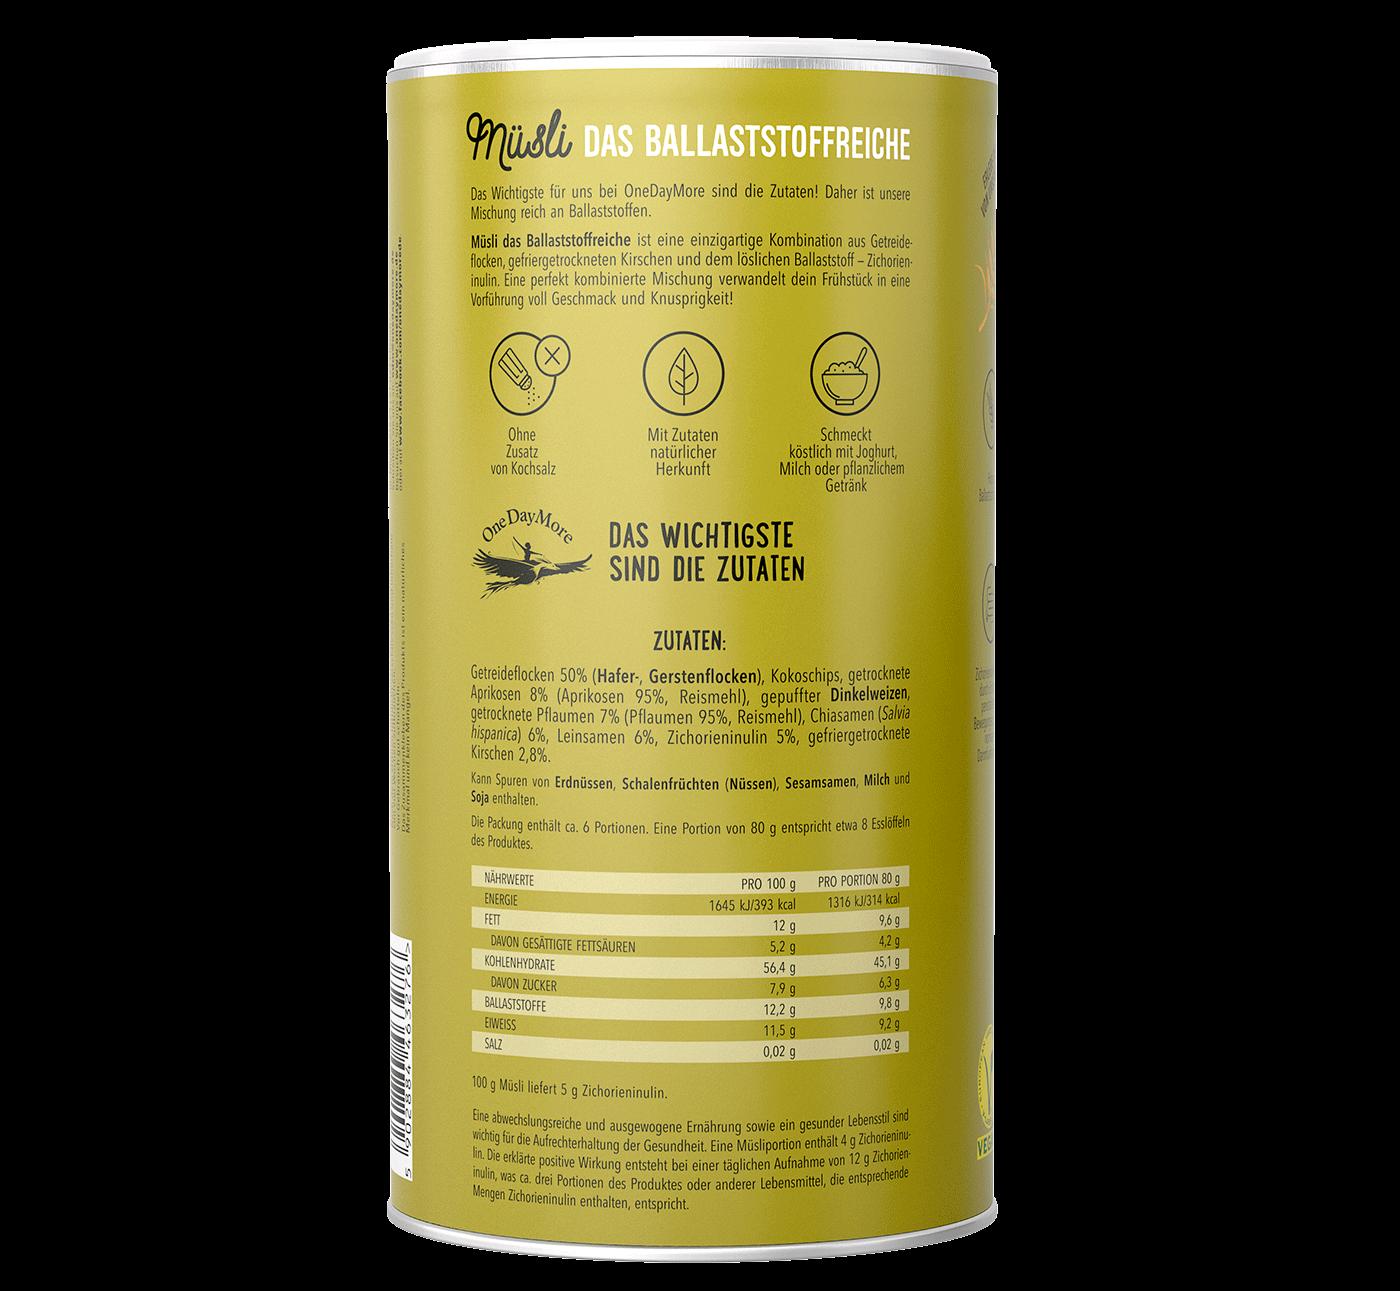 musli-das-balaststoffreiche-onedaymore-tyl-tuba-1400×1291